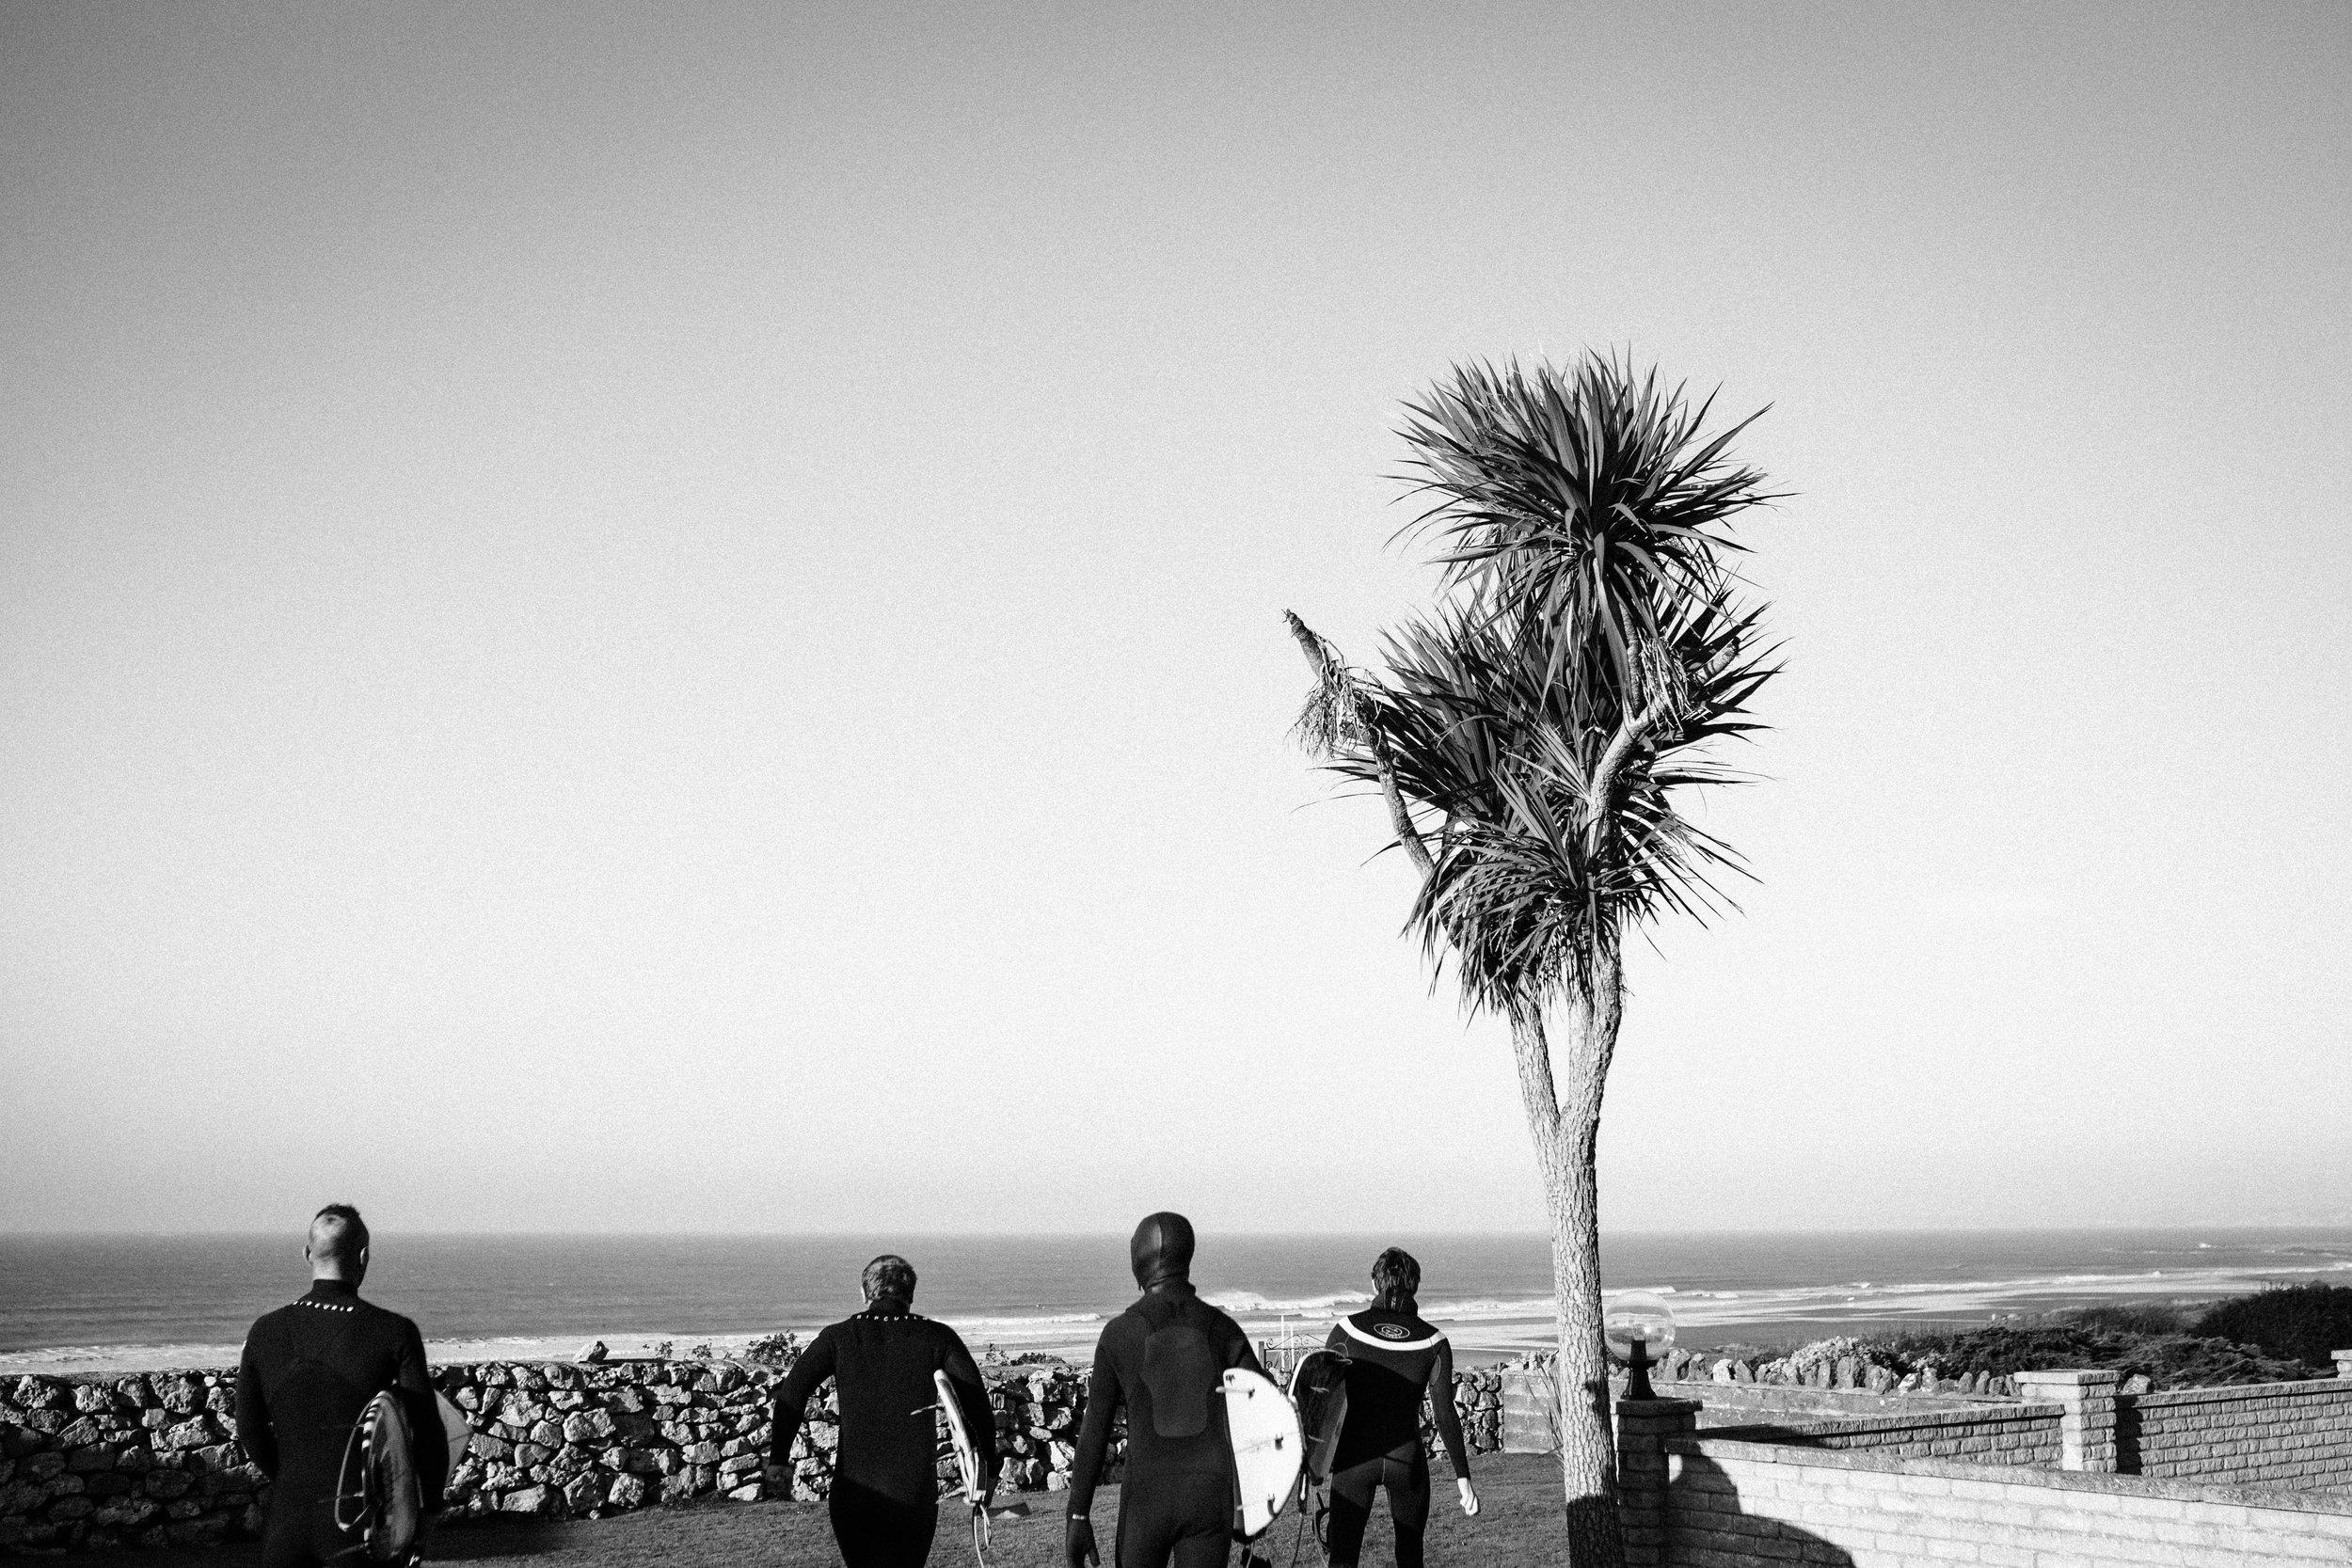 Alex_Sedgmond_Photography-Cardiff-SouthWales-PorthcawlRestbay-Surfing-EzraHames-19.jpg